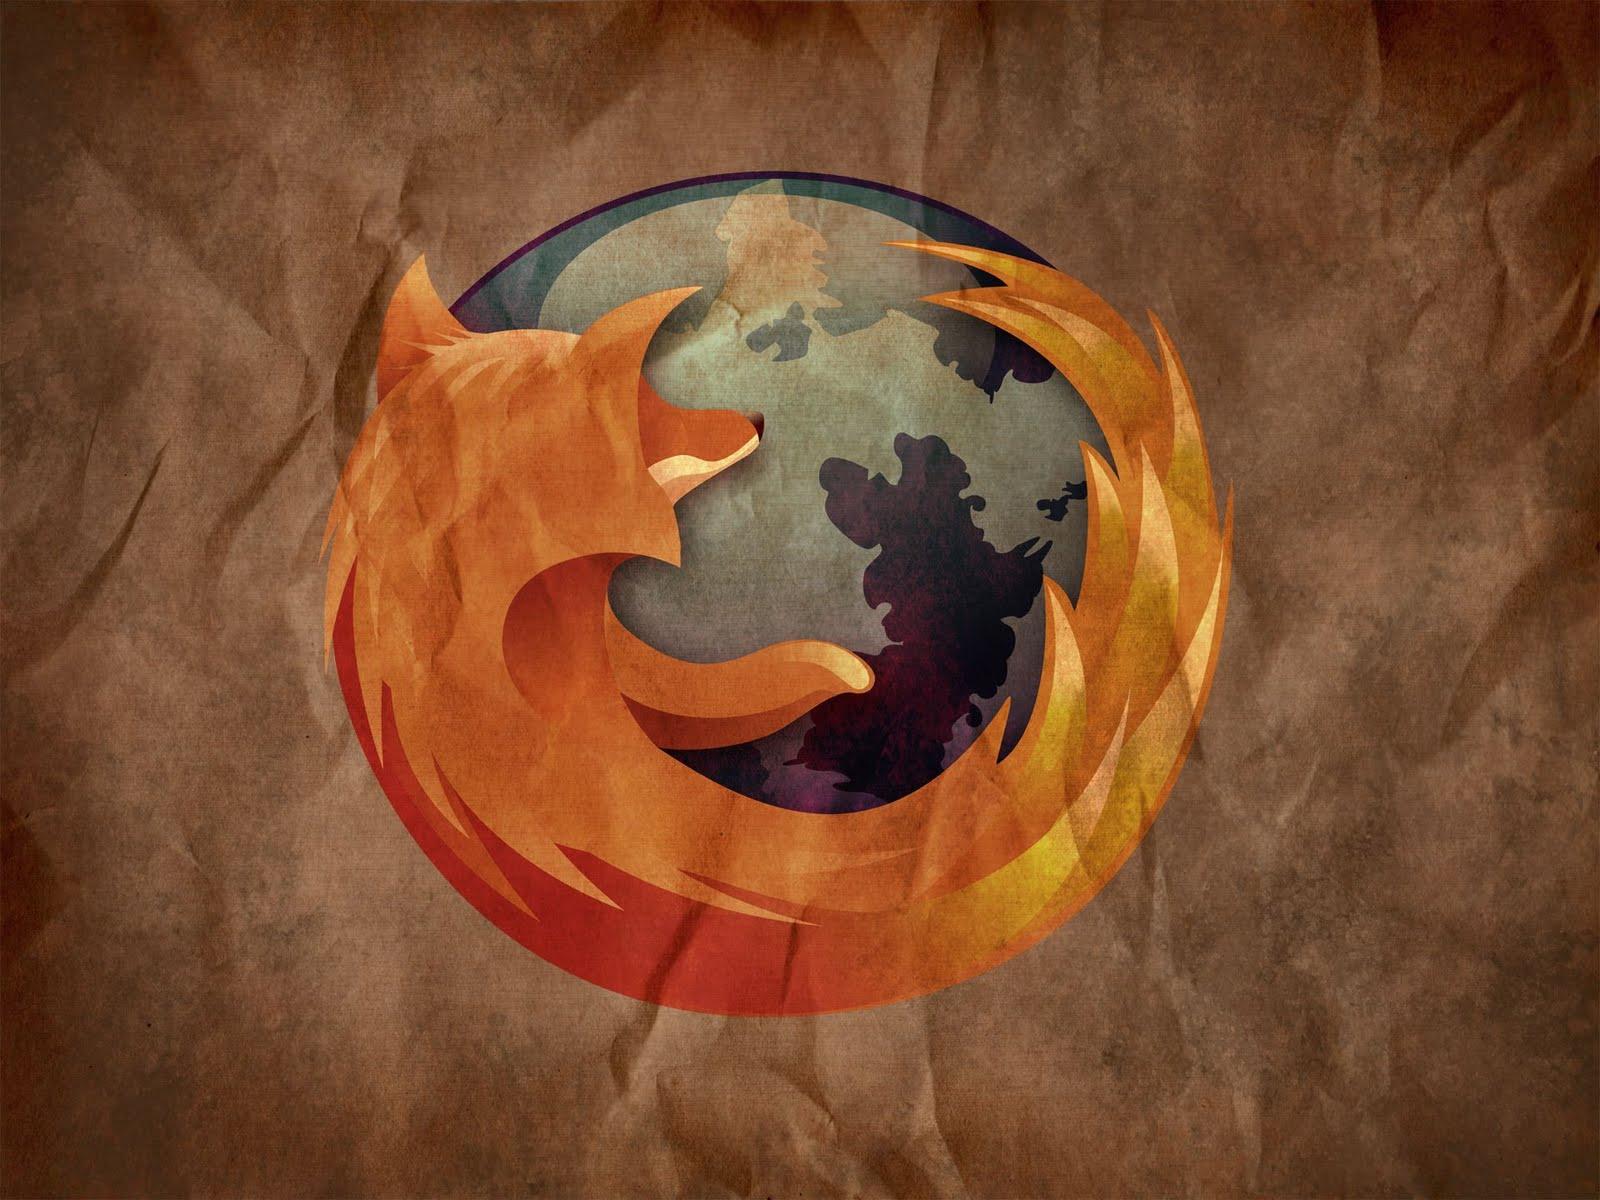 http://1.bp.blogspot.com/_2UbsSBz9ckE/SvIvxEuk29I/AAAAAAAAATU/O9RQ1ZvPujQ/s1600/Firefox%2Bhd%2Bwallpaper%2B2.jpg